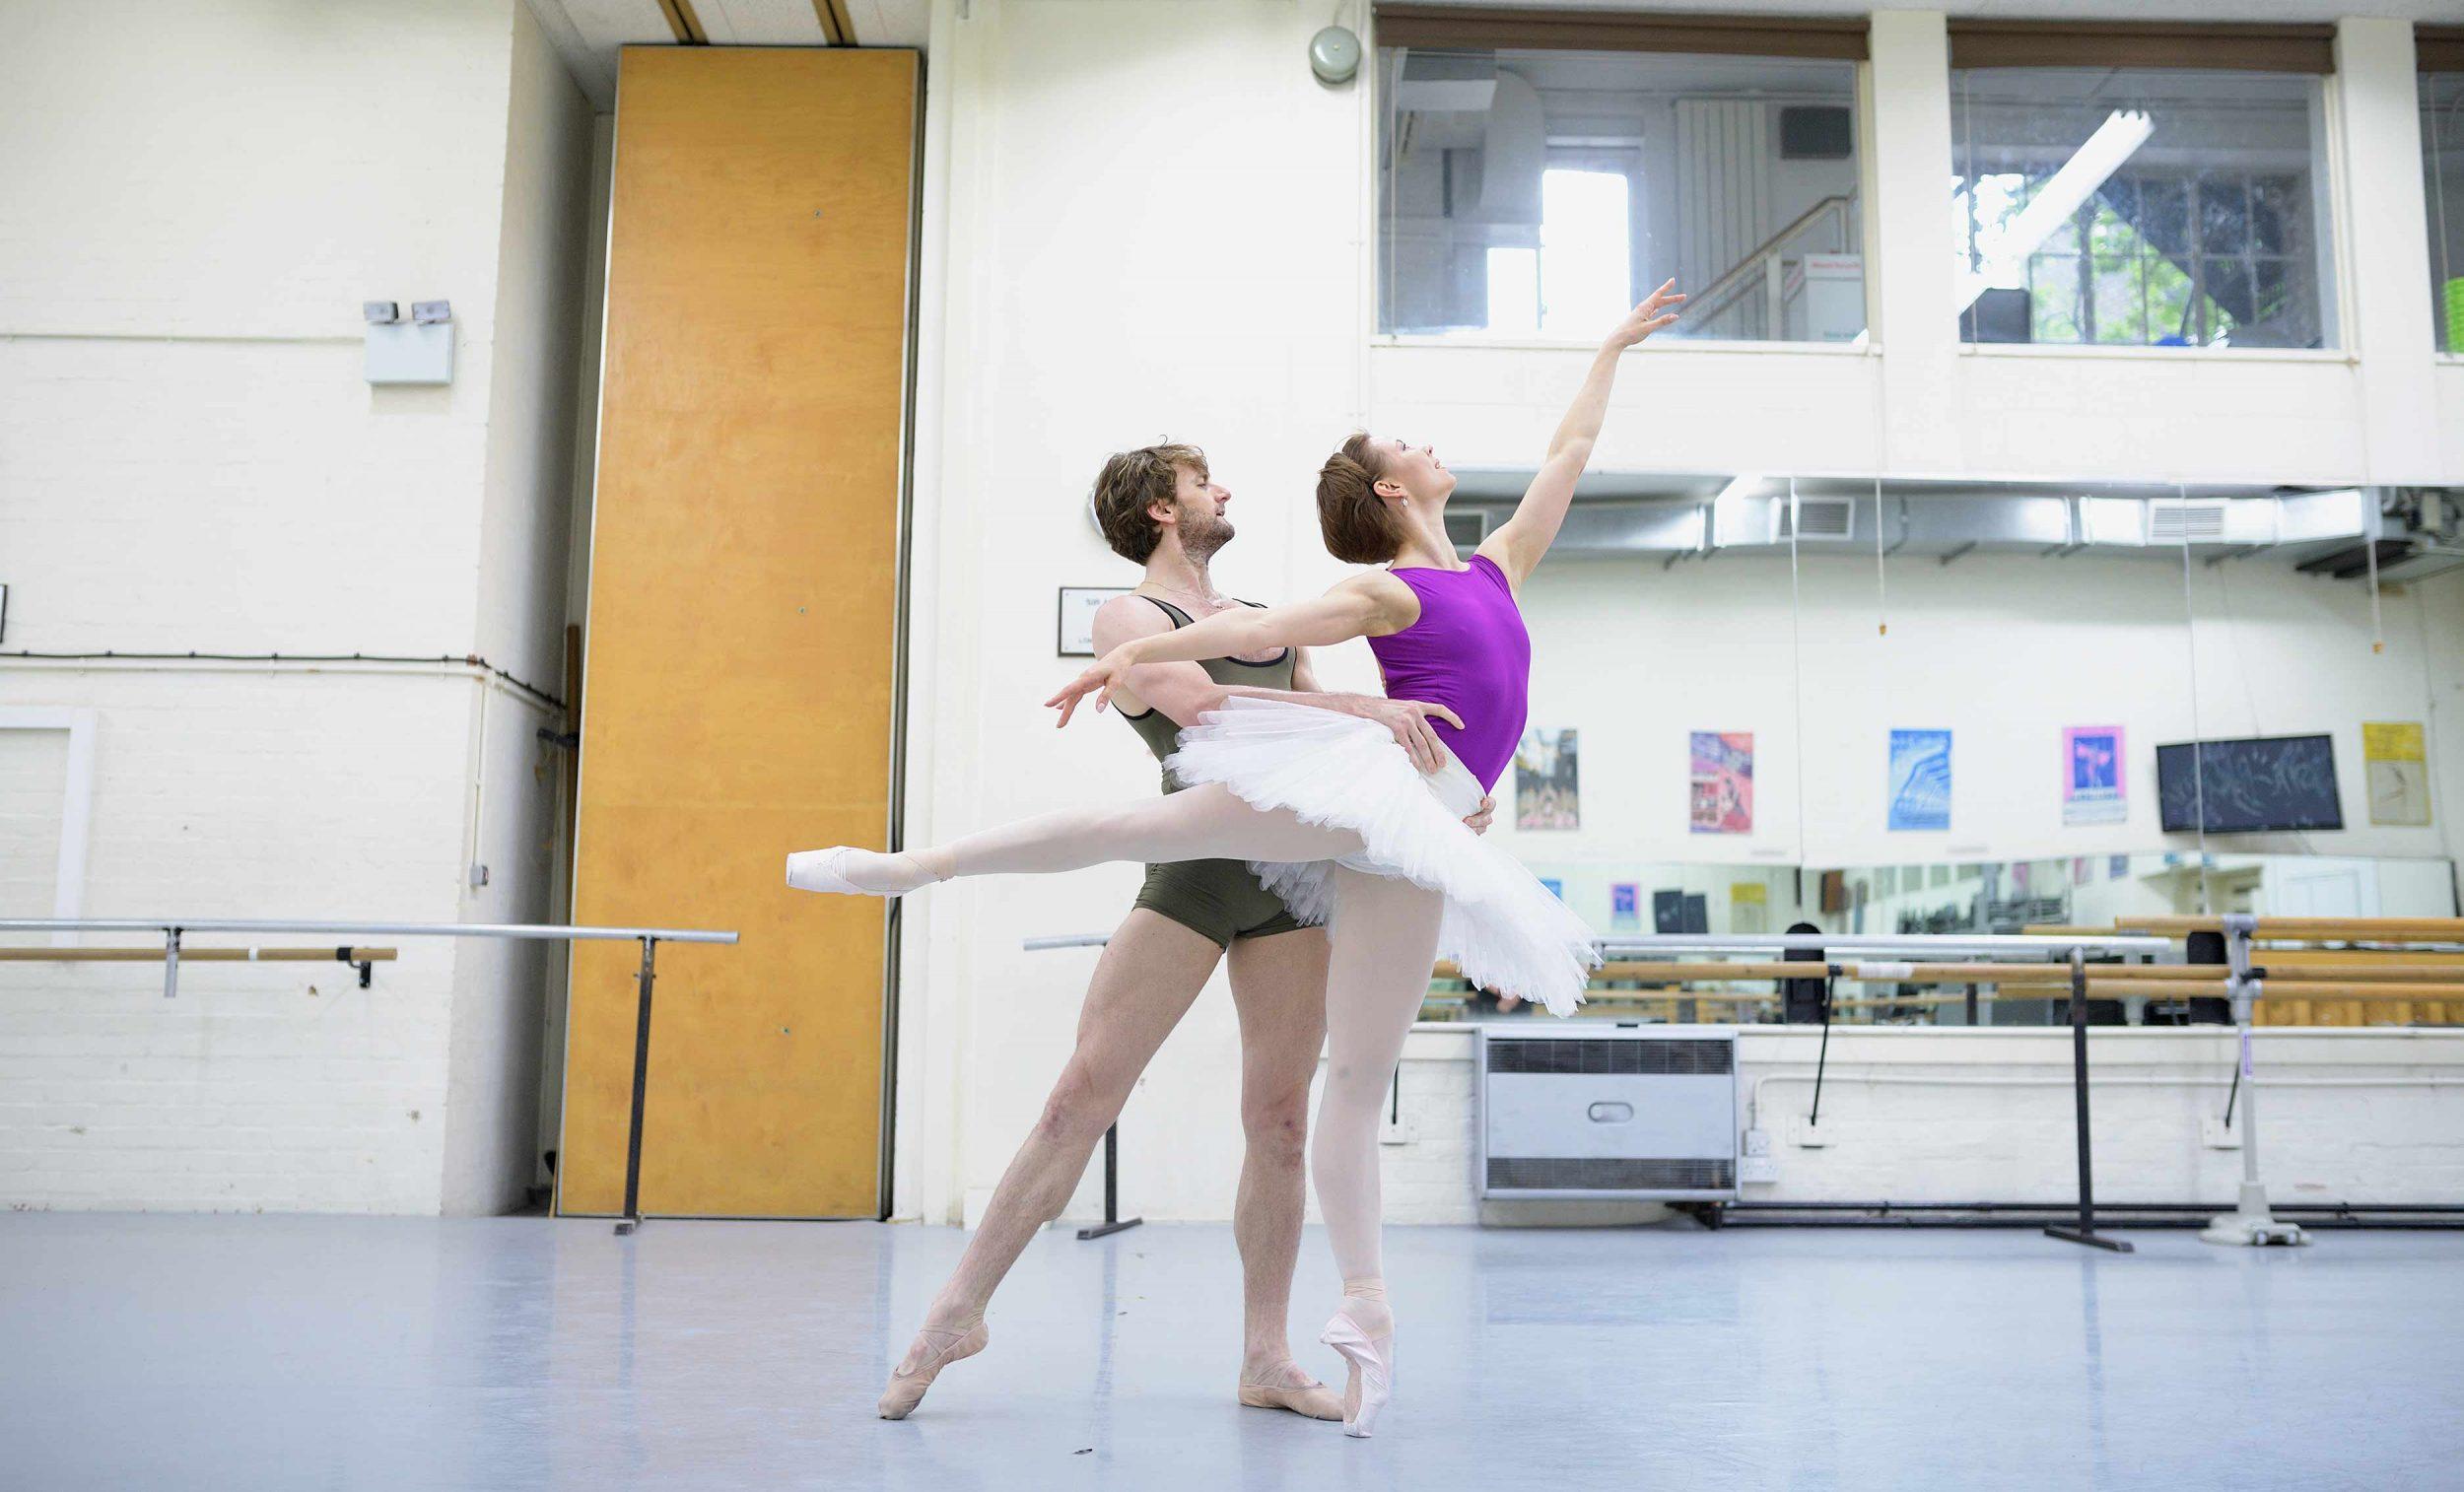 Maria-Alexandrova-and-Aaron-Robison-rehearsing-The-Sleeping-Beauty-©-Laurent-Liotardo-(2)